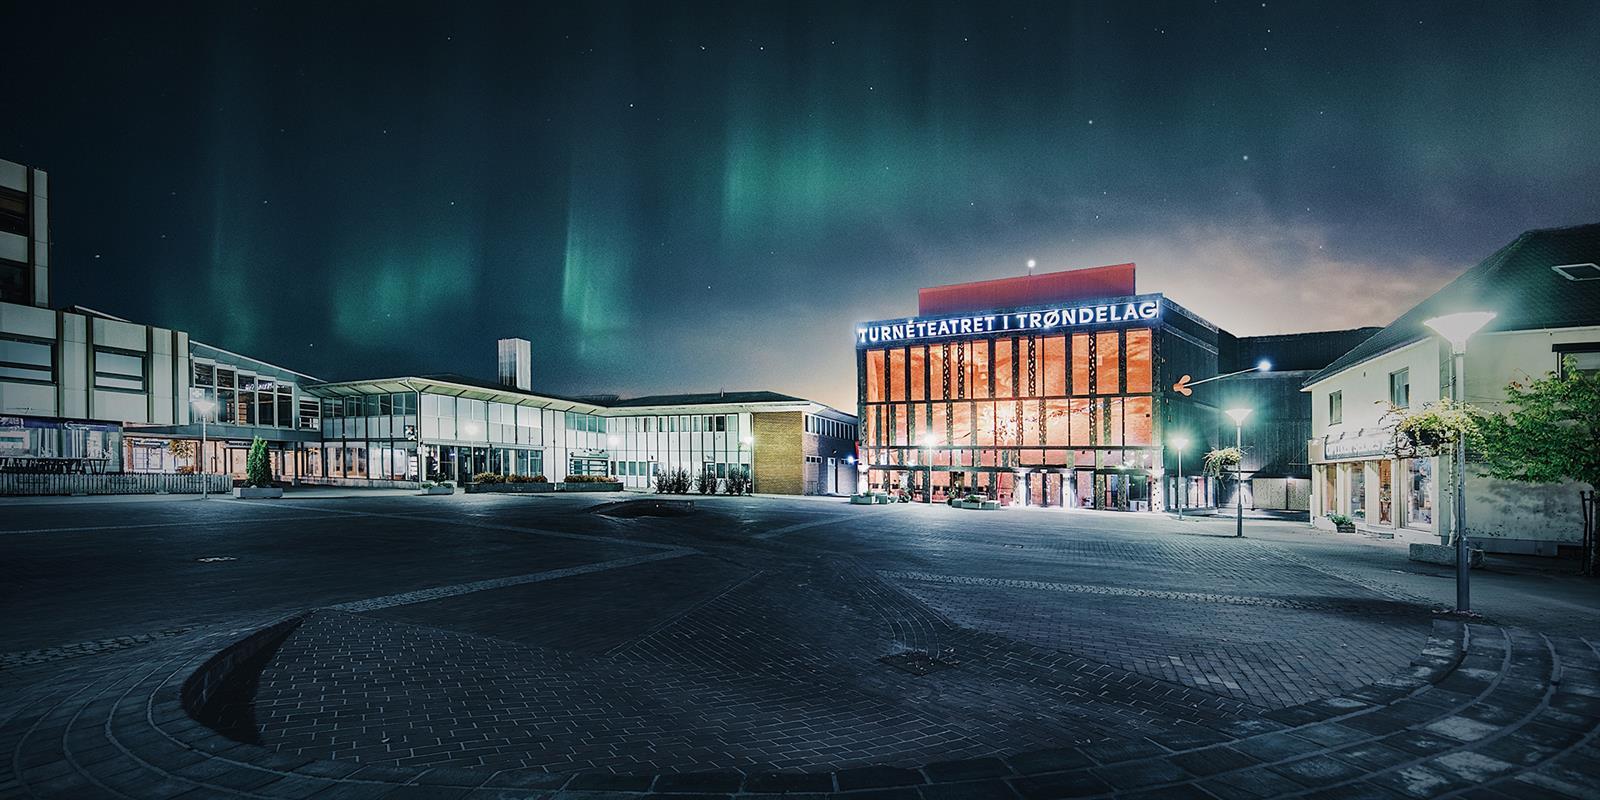 Turnéteatret i Trøndelag